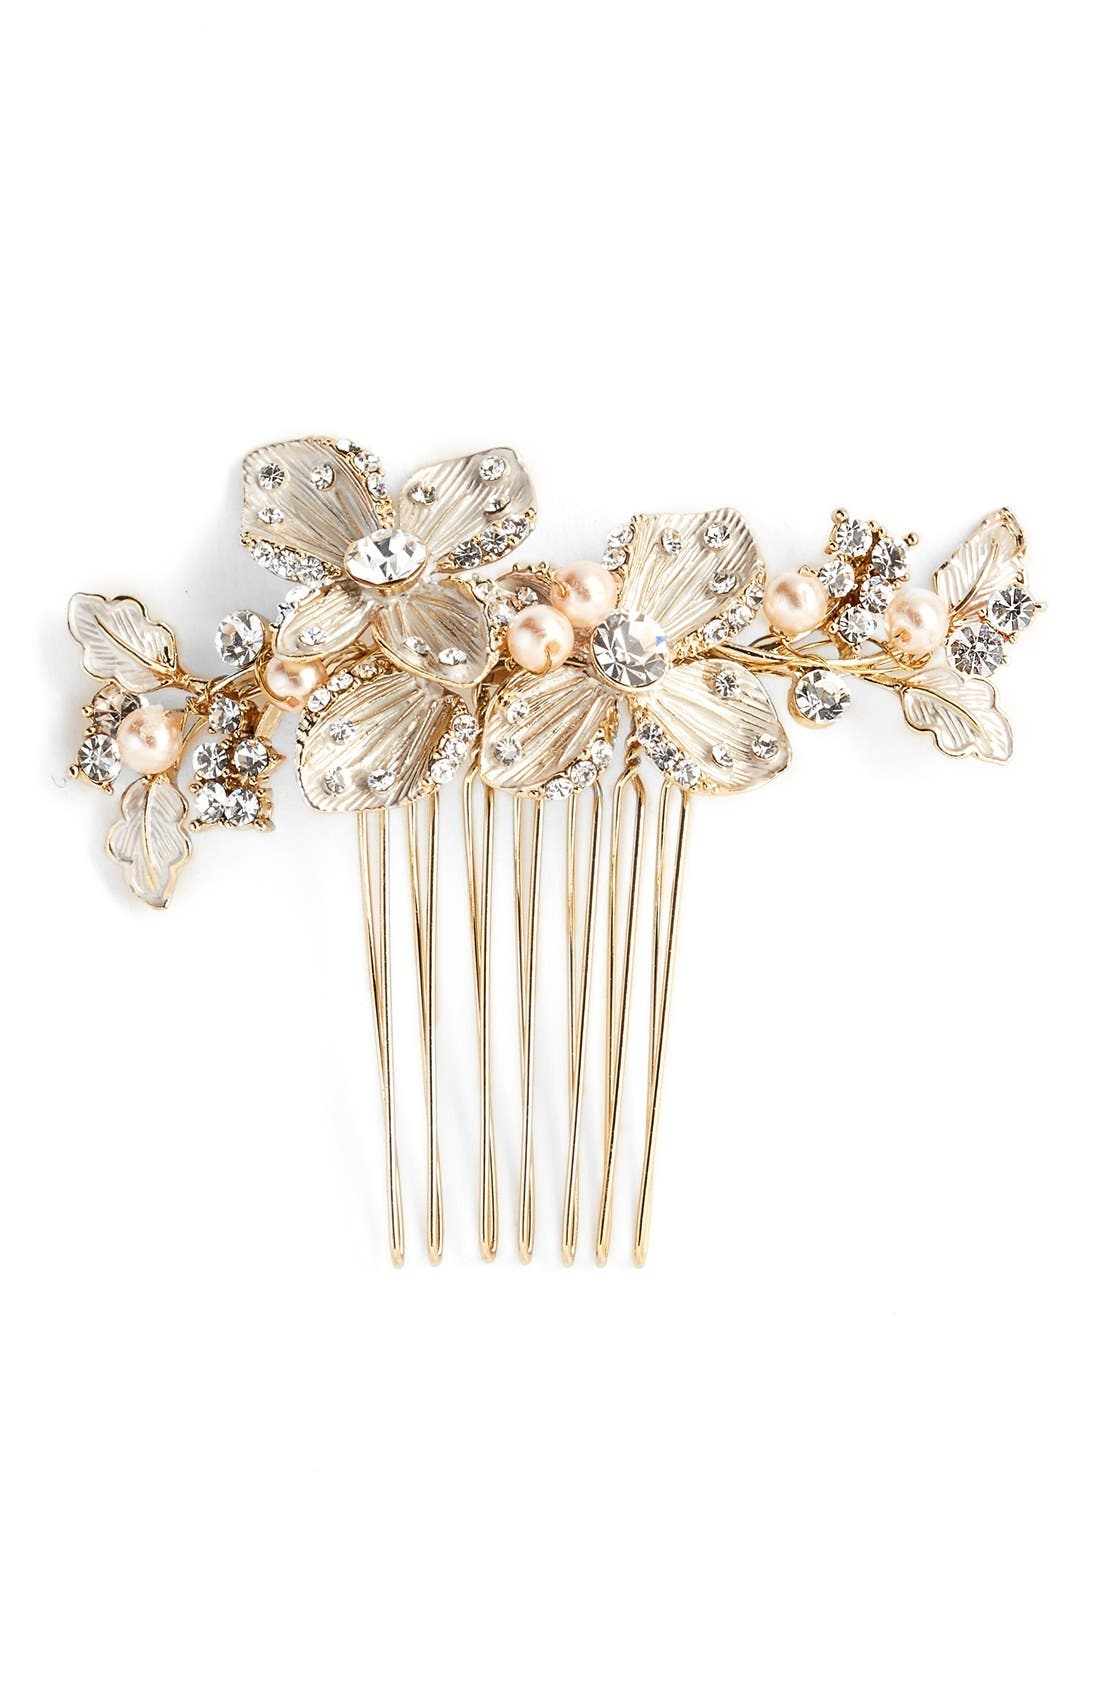 Alternate Image 1 Selected - Wedding Belles New York 'Petite Garden' Crystal Hair Comb